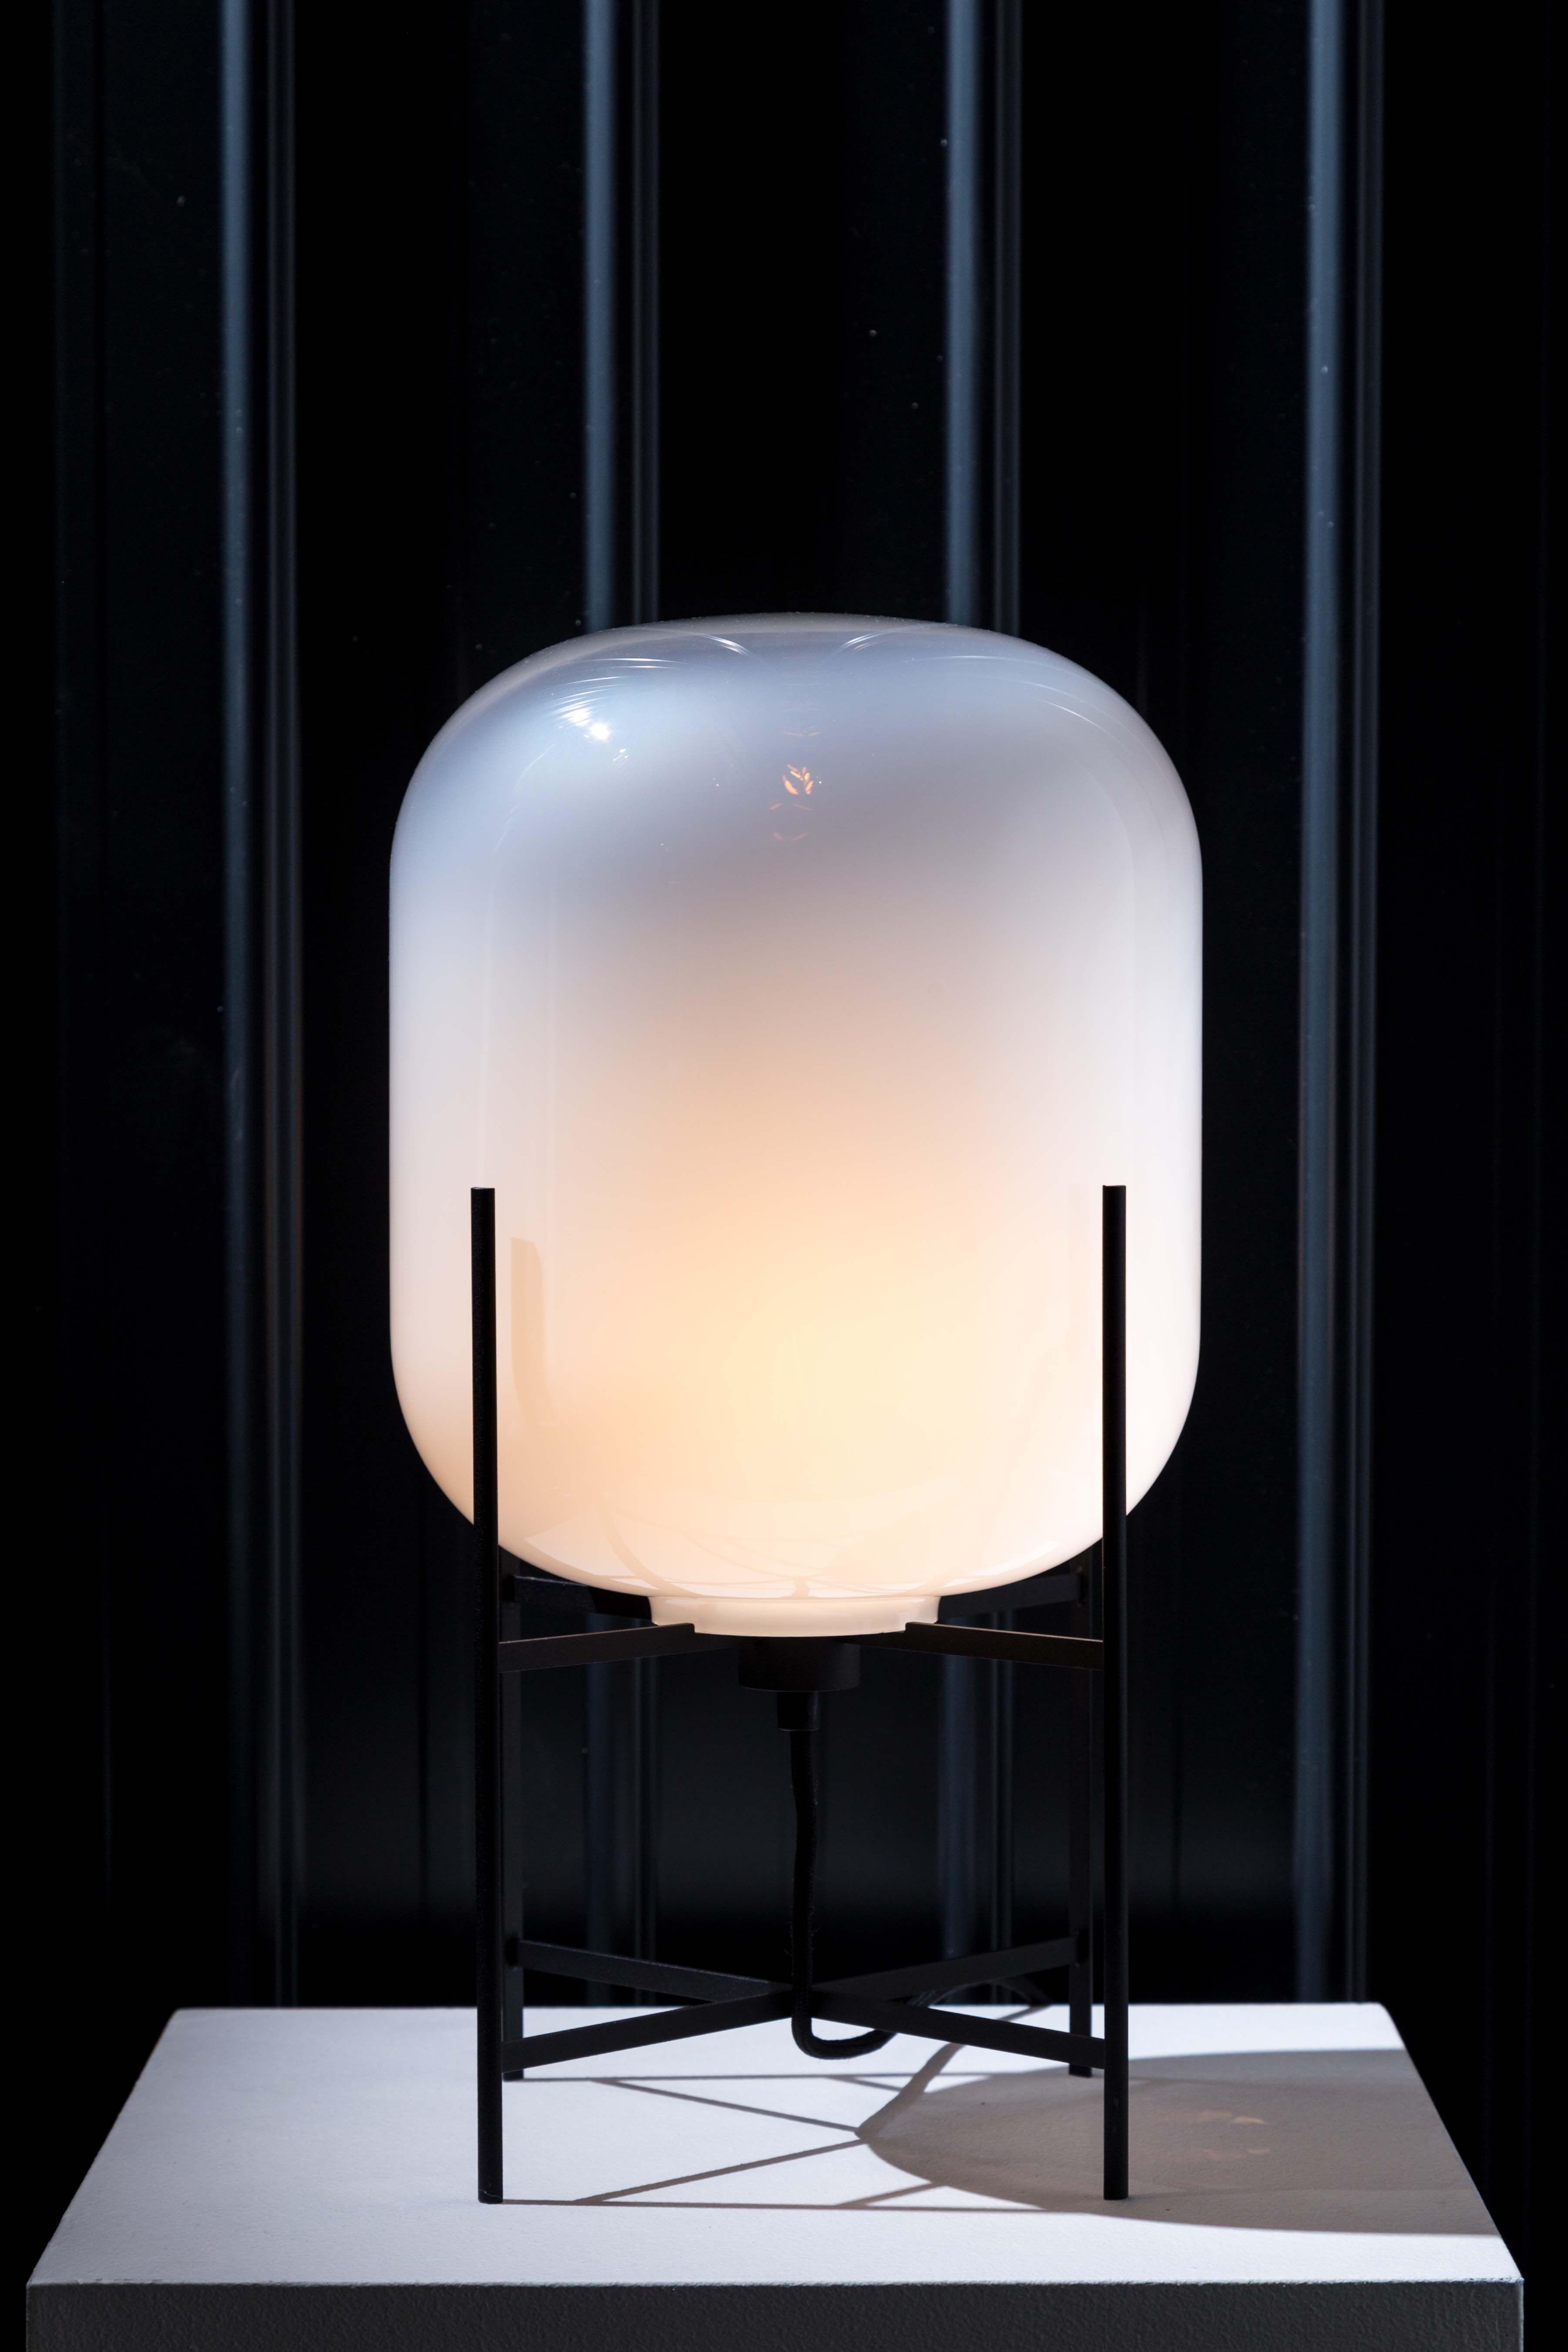 Oda By Sebastian Herkner For Pulpo Lampe Mundgeblasenes Glas Glastische